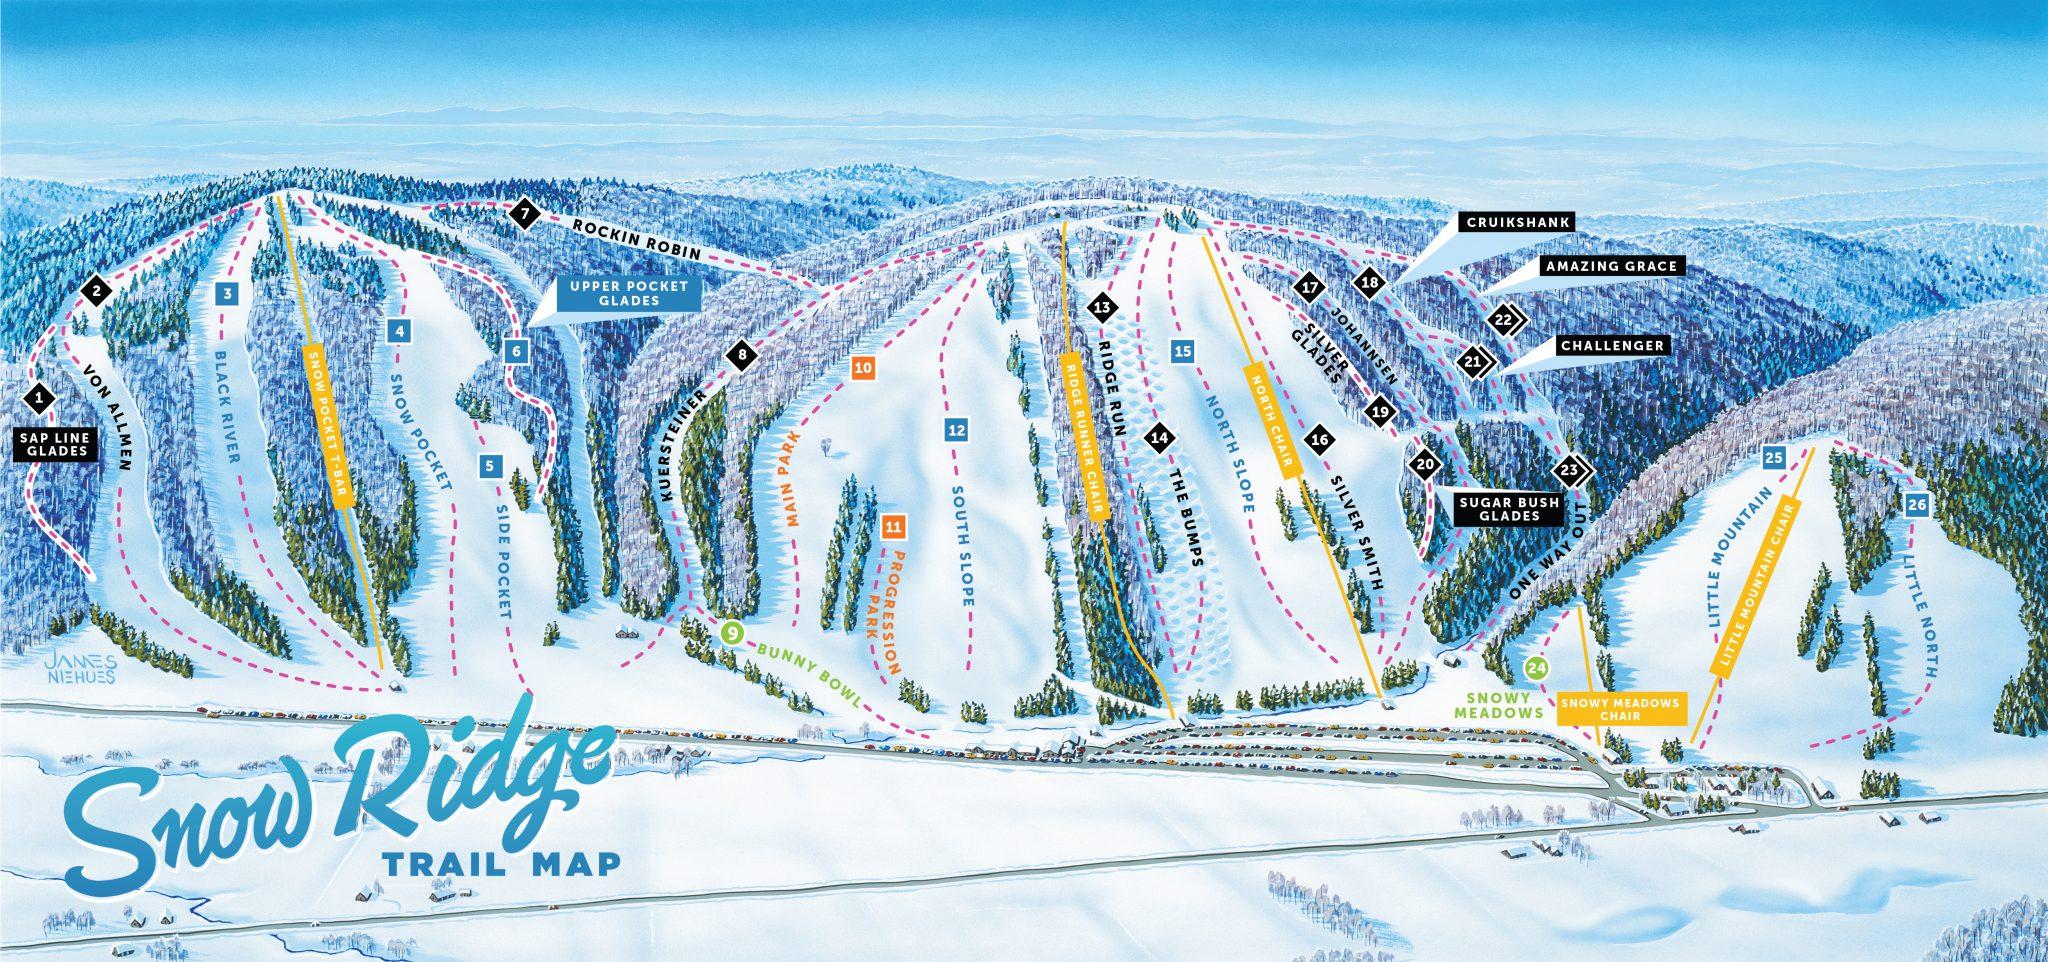 Snow Ridge trail map